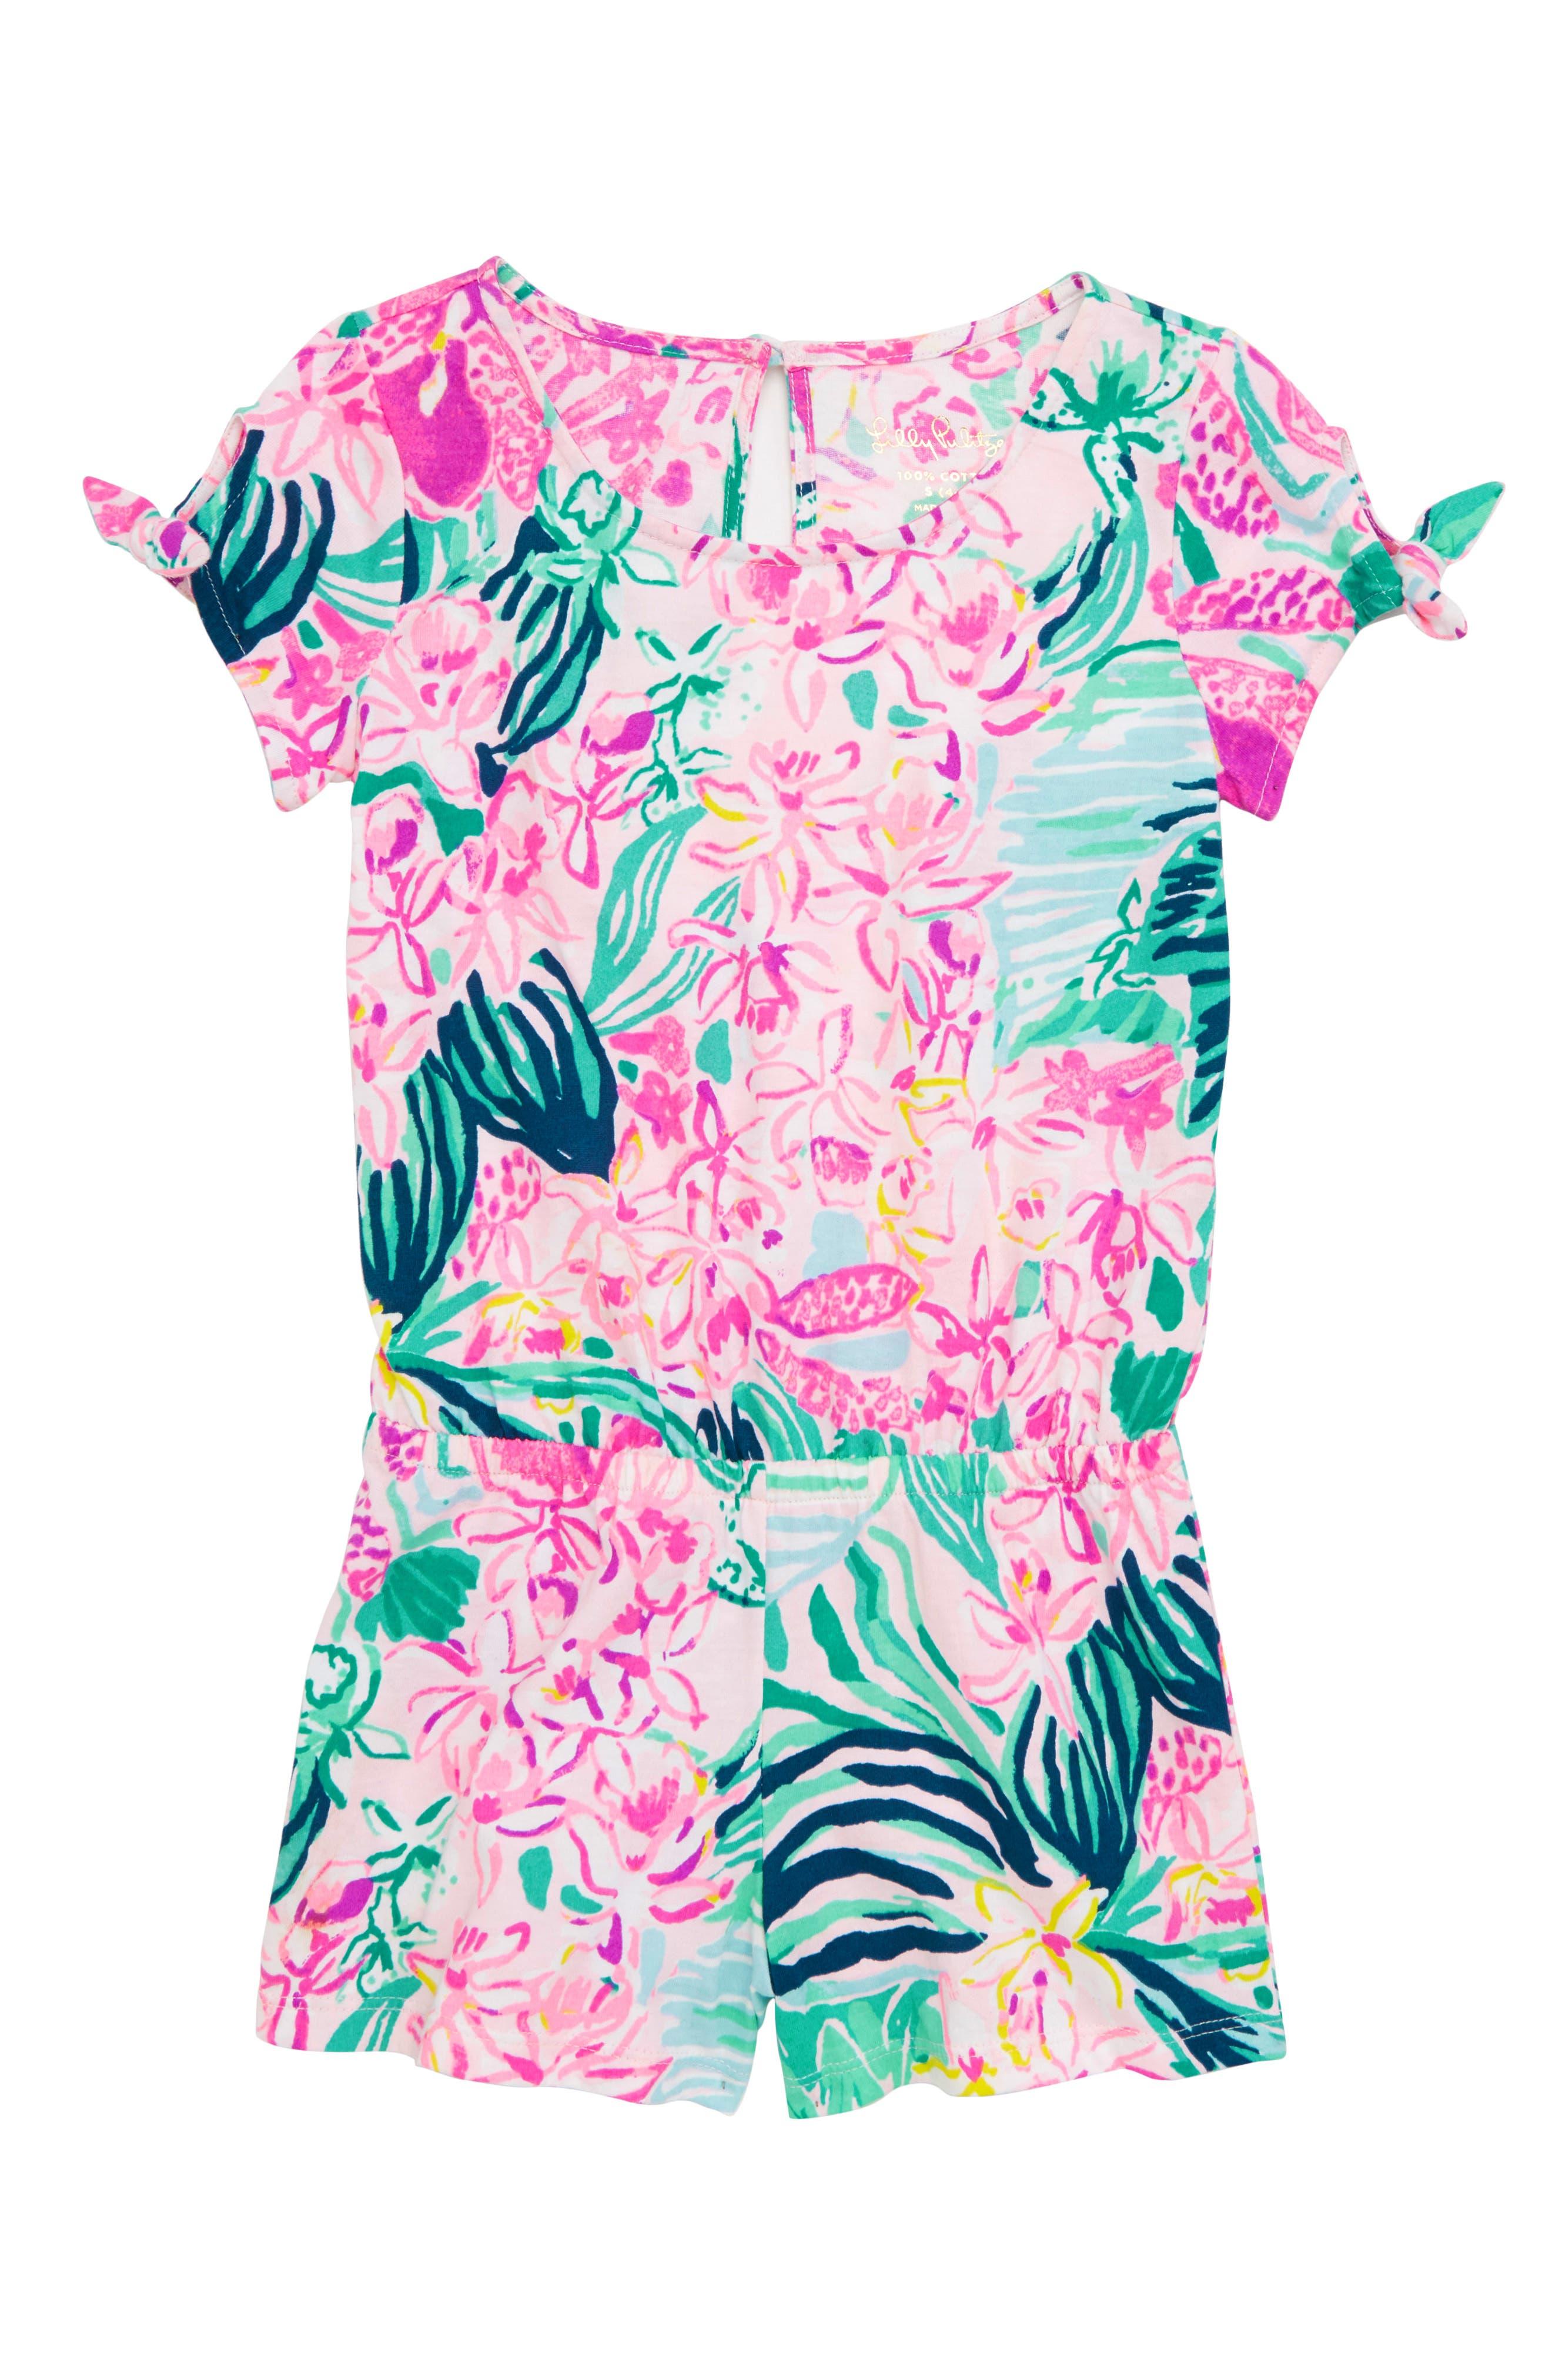 Girls Lilly Pulitzer Camryn Tie Sleeve Romper Size XL (1214)  Green